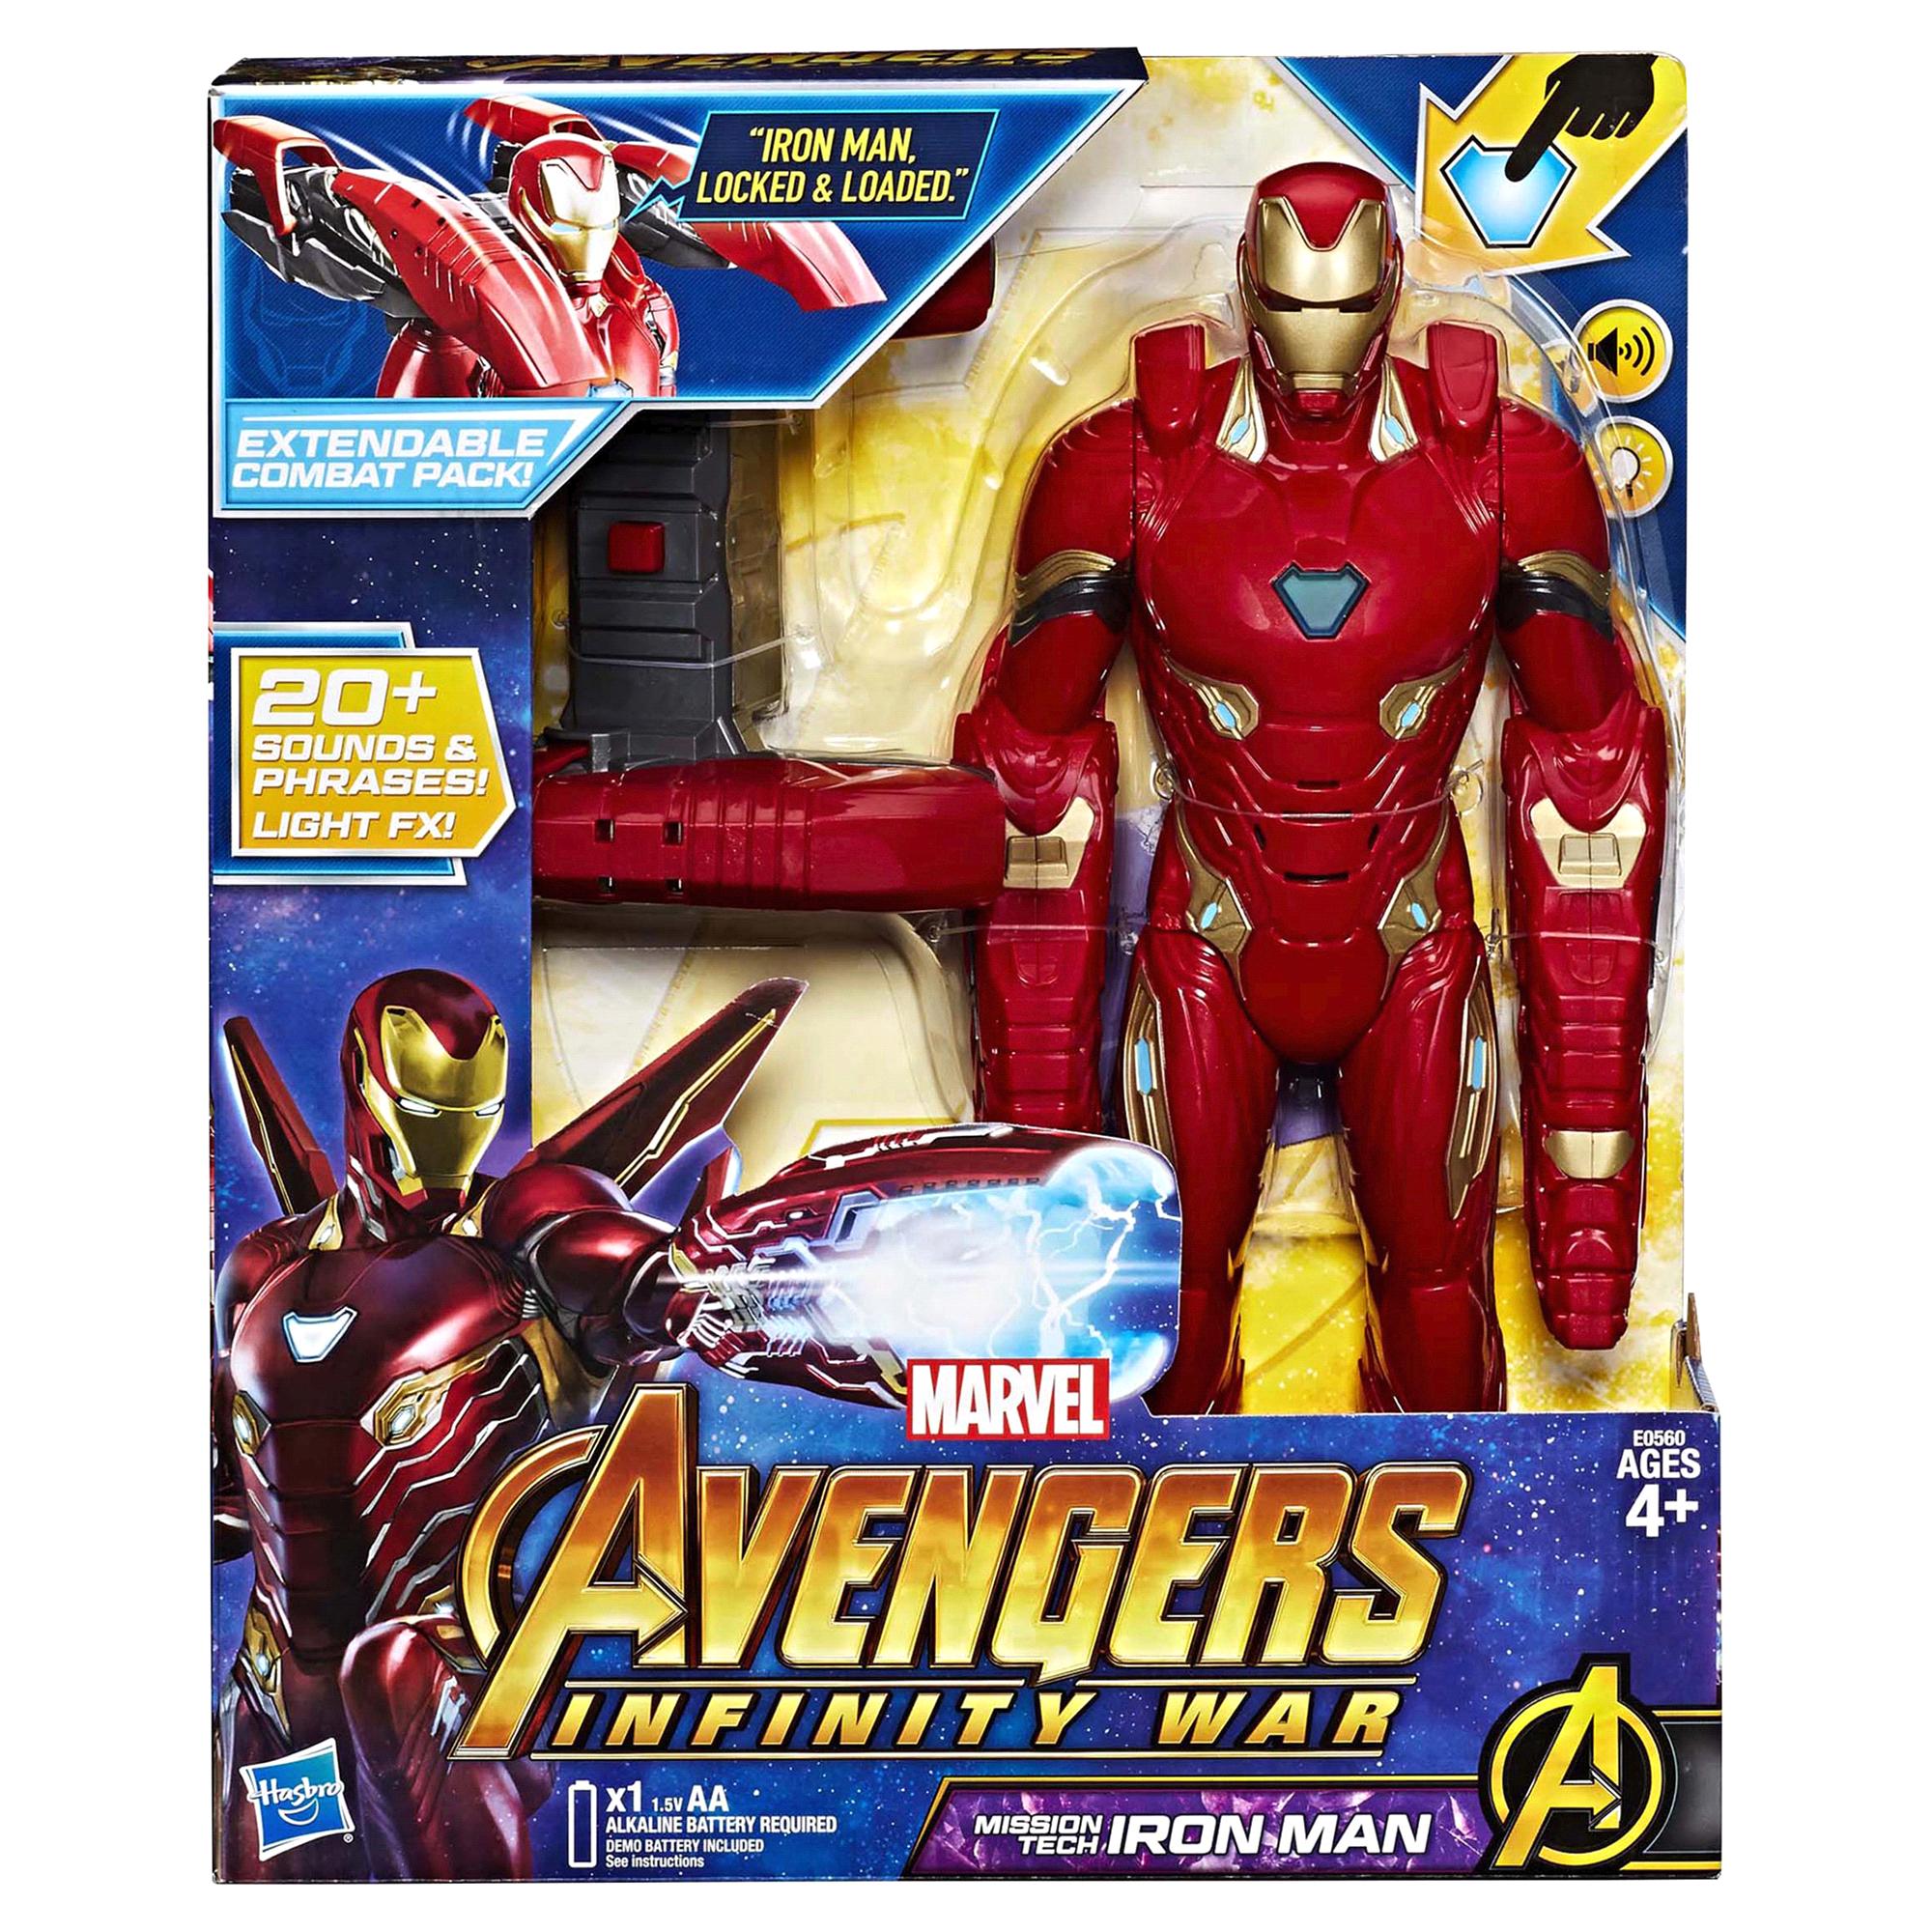 Marvel Avengers Infinity War Mission Tech Iron Man Figure Ironman Red Tees